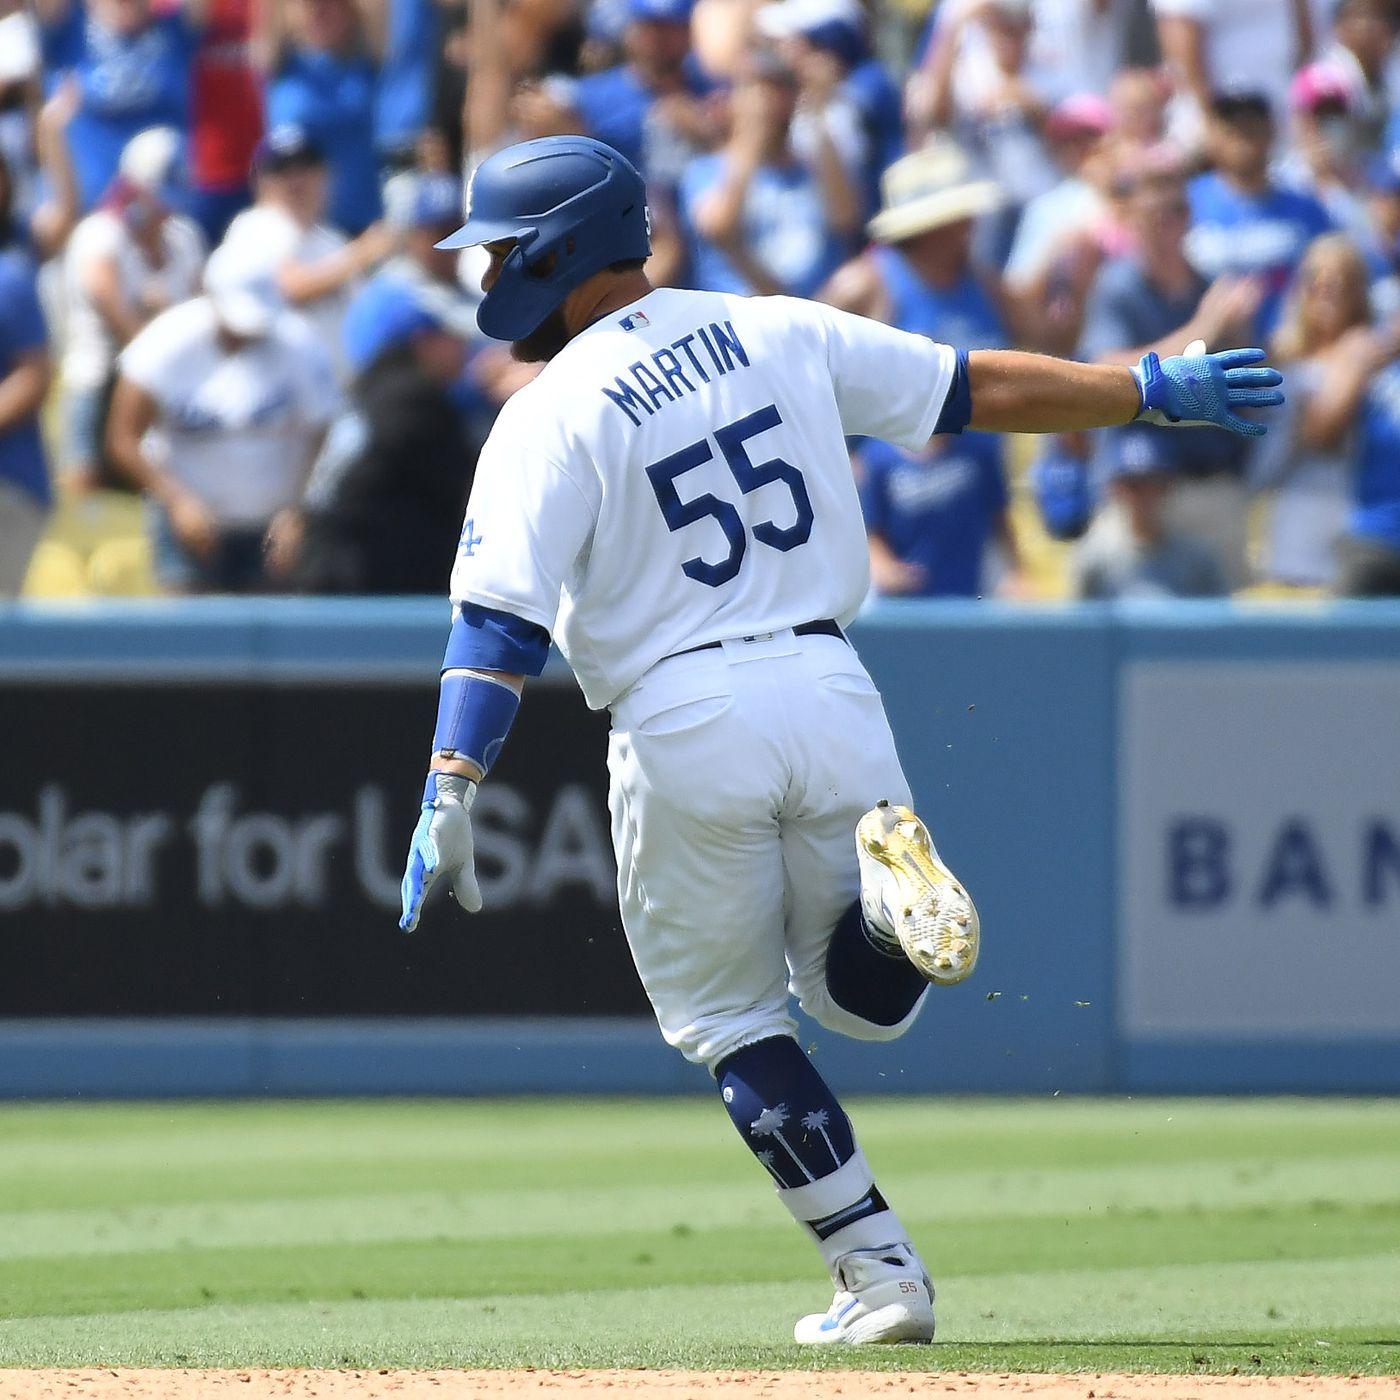 4416a466 Dodgers Recap: The Dodgers unsurprisingly walk-off again, defeat ...